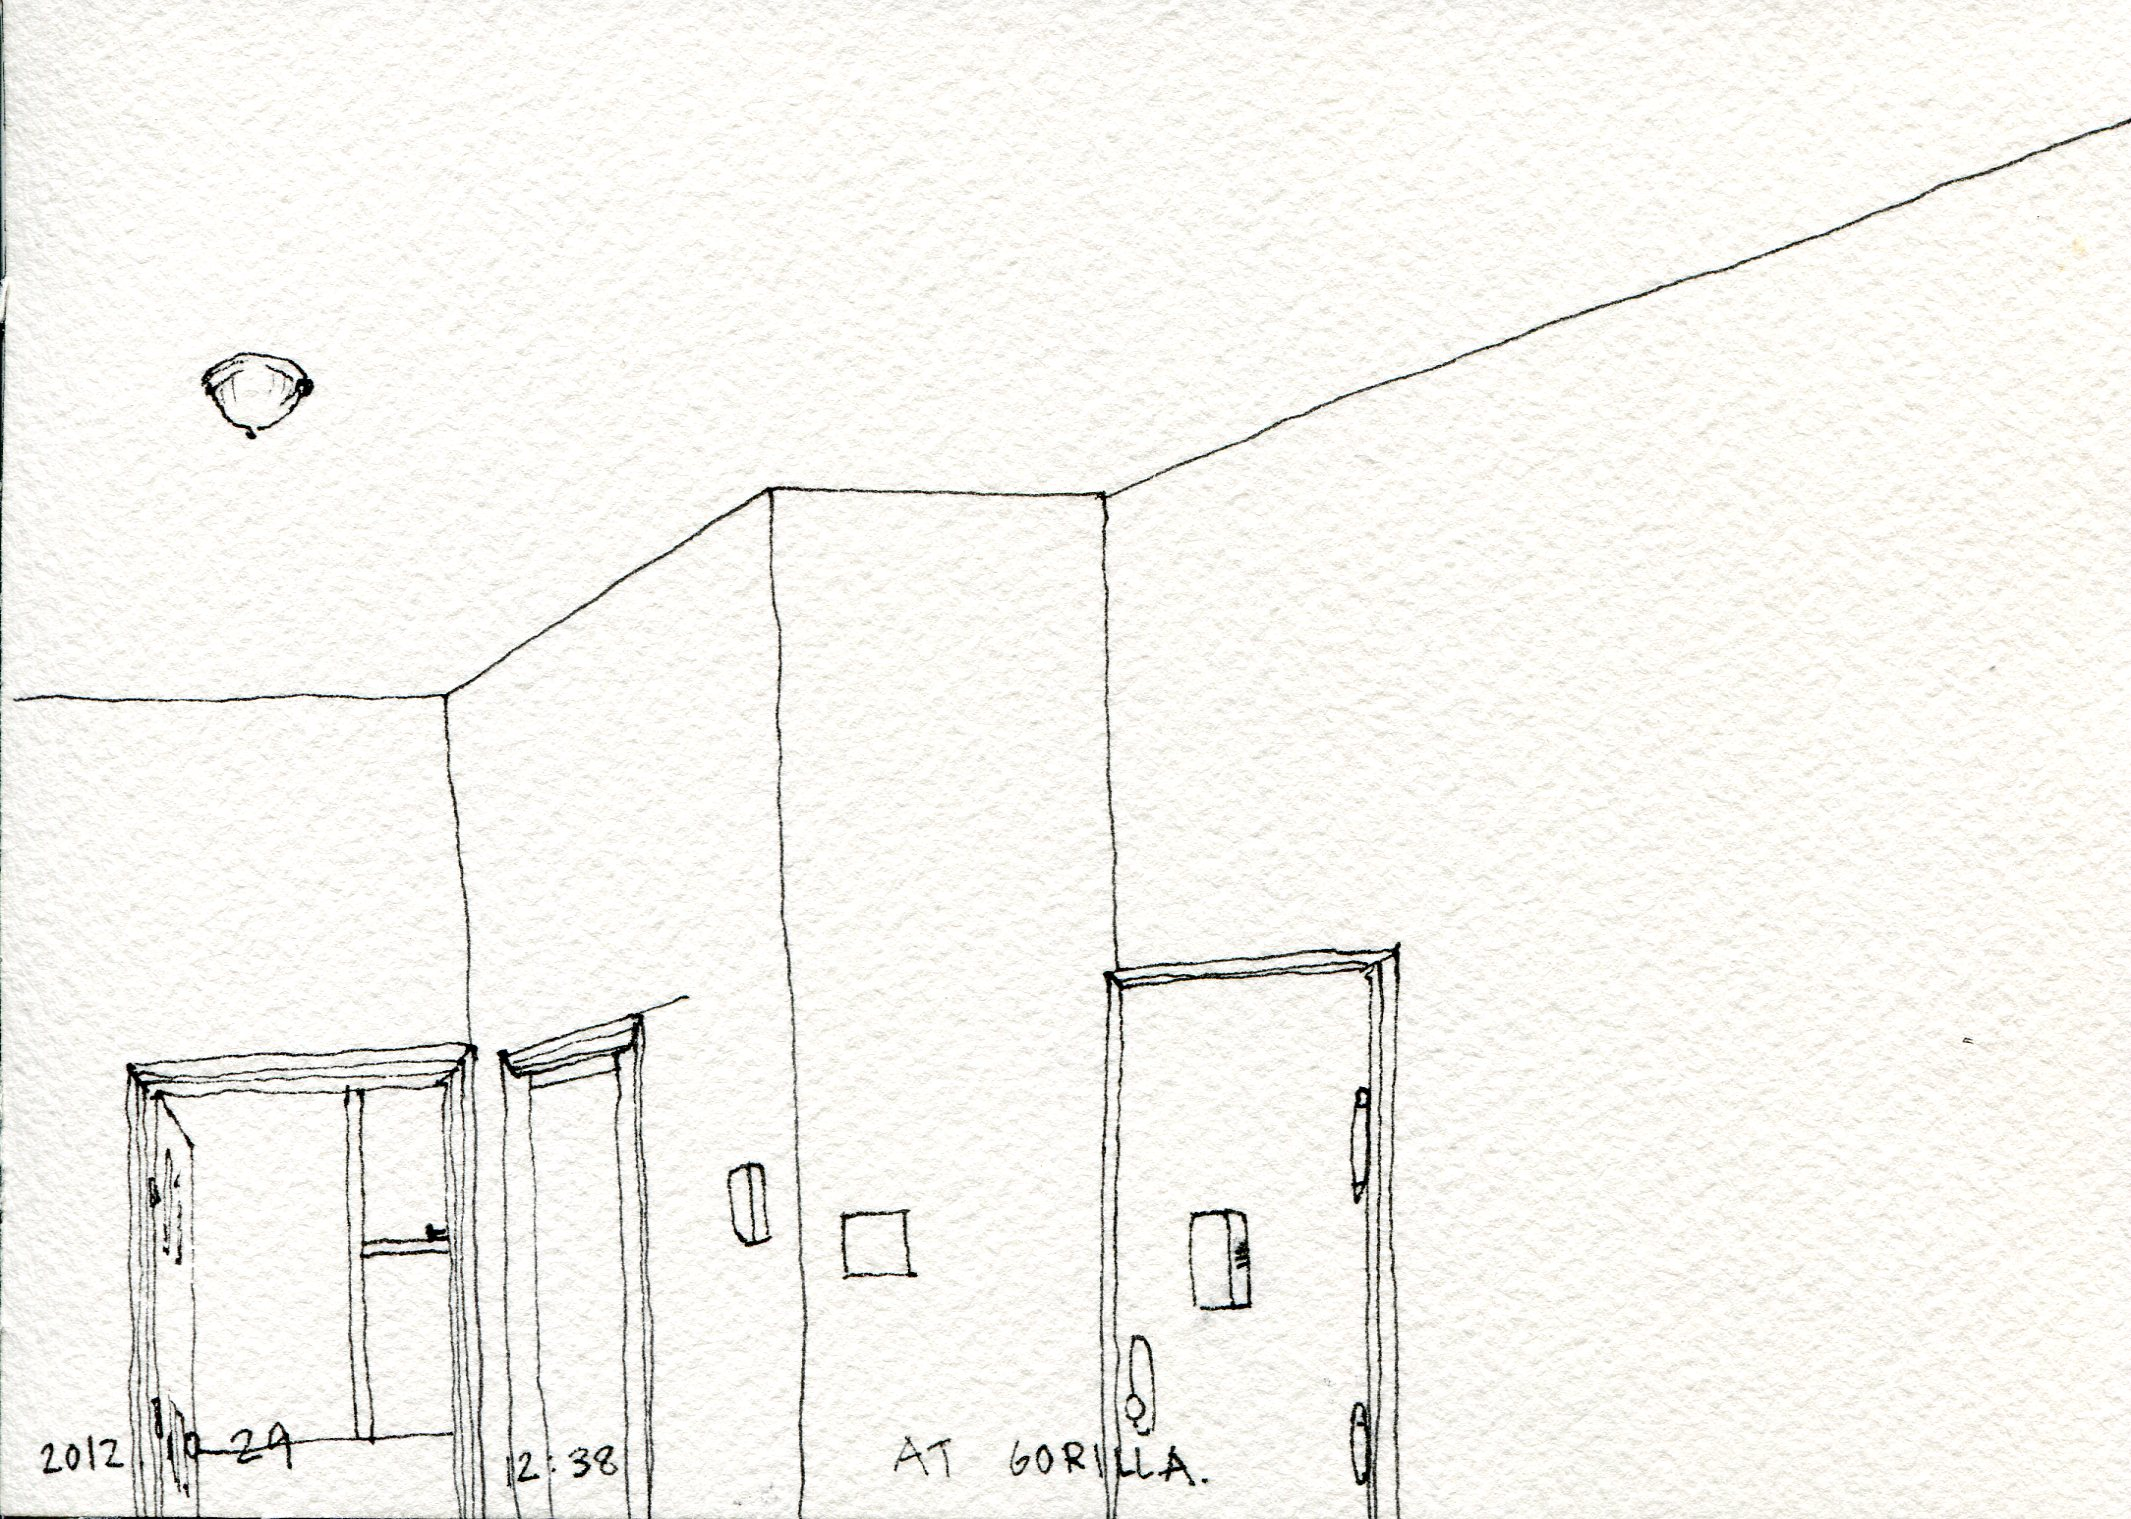 2012-10-30 drawing009.jpg